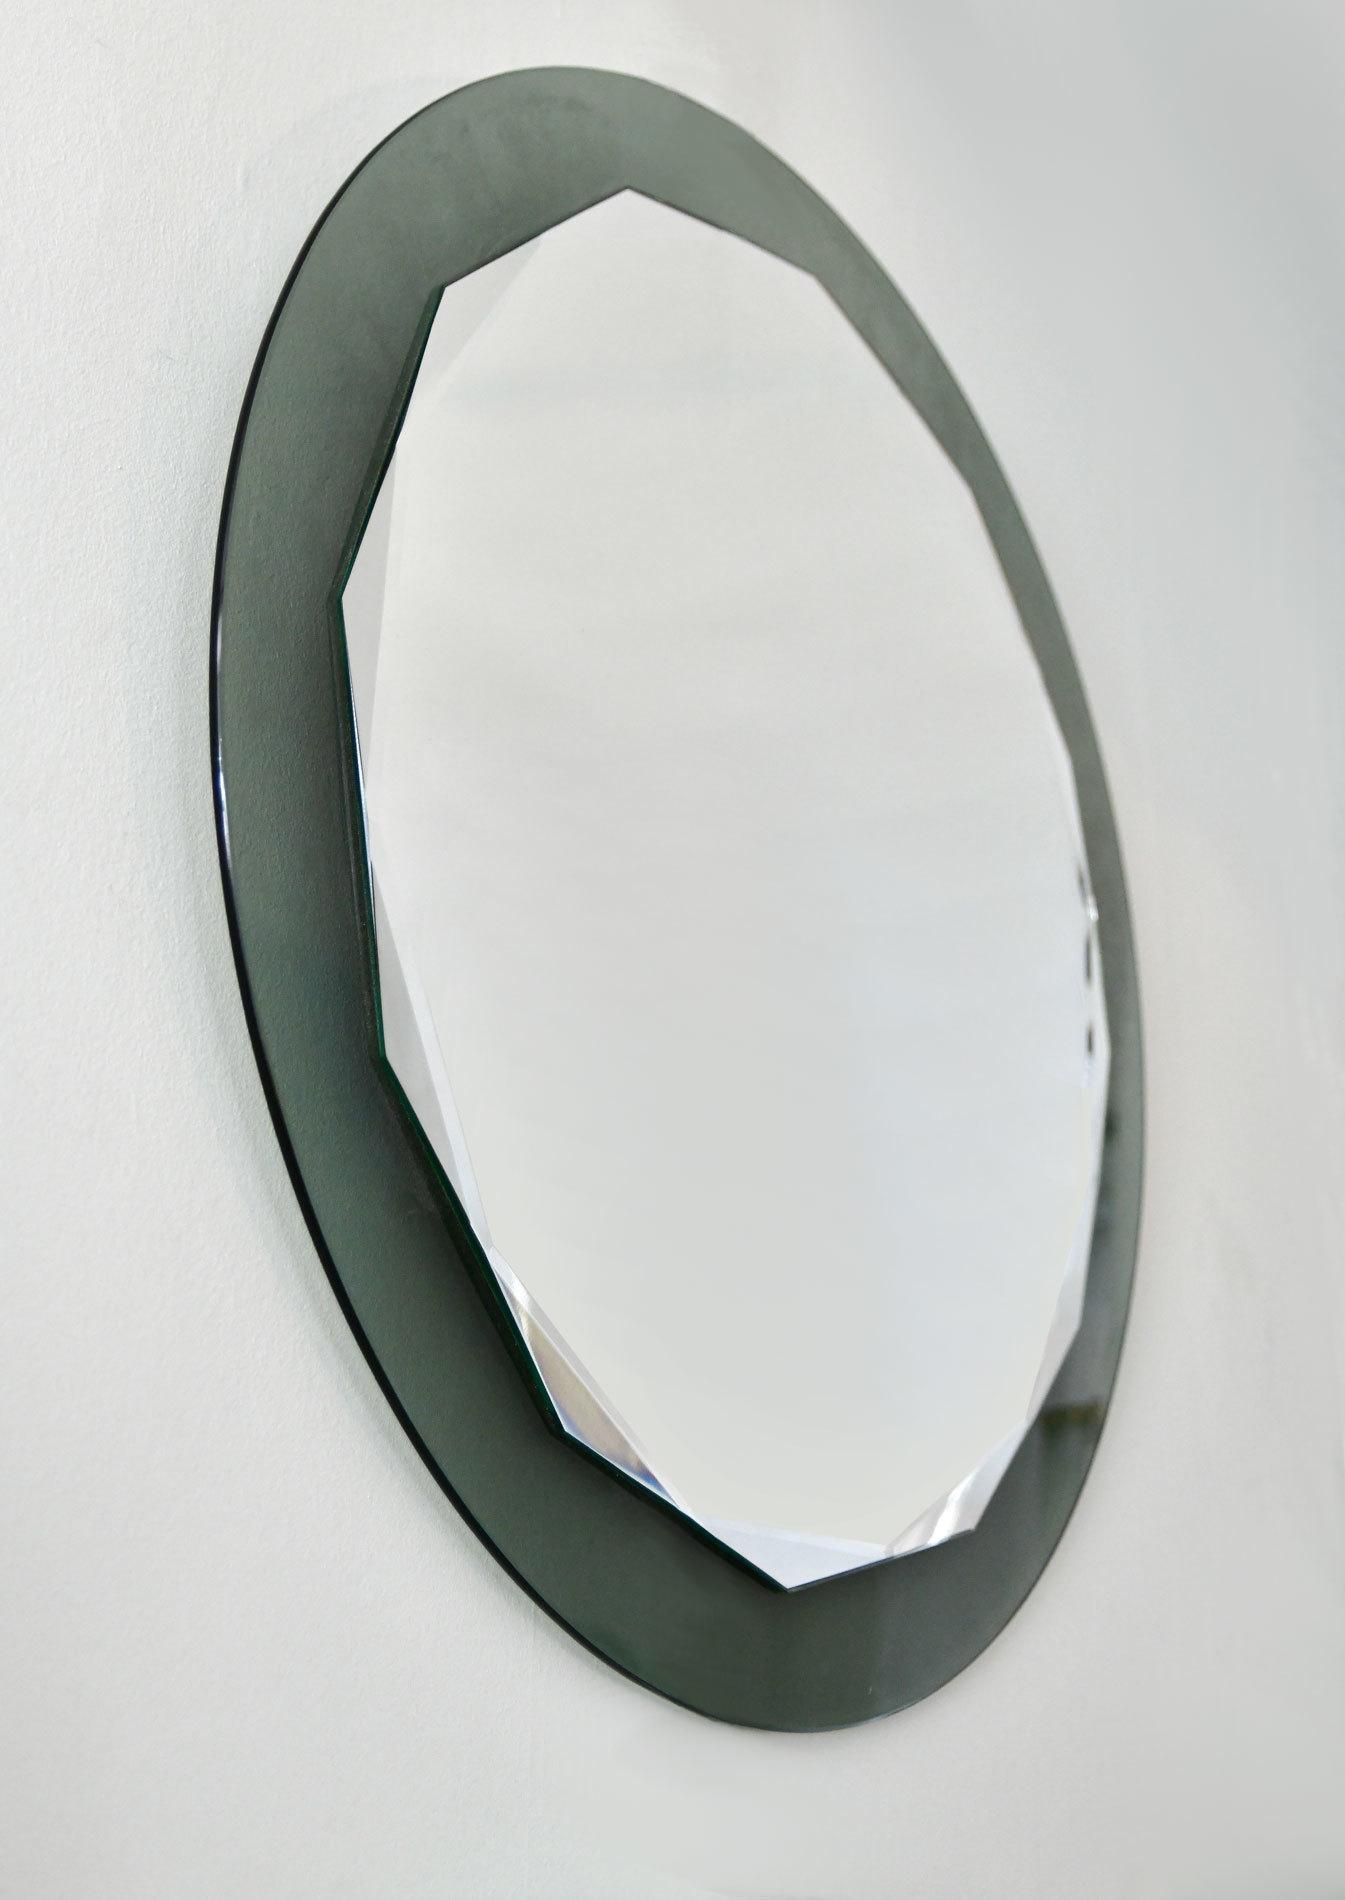 Cystal Arte Circular Mirror 03